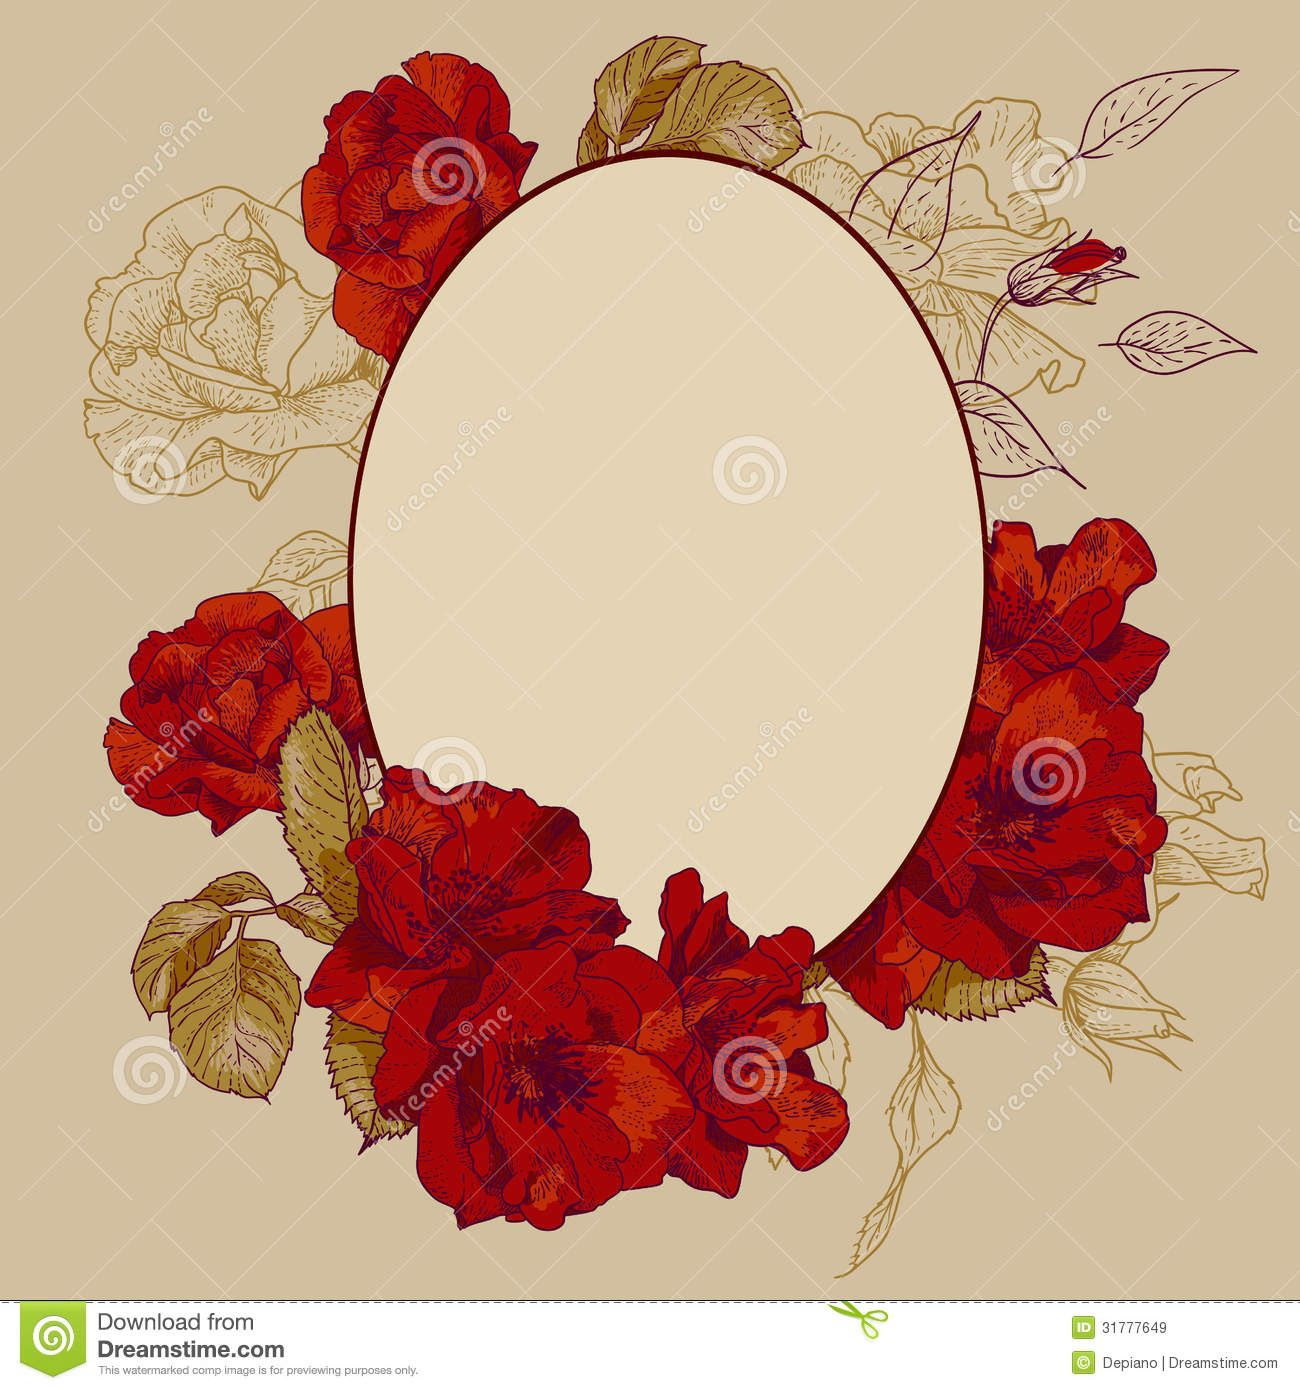 Vintage Roses Oval Frame Royalty Free Stock Image - Image: 22857686 ...